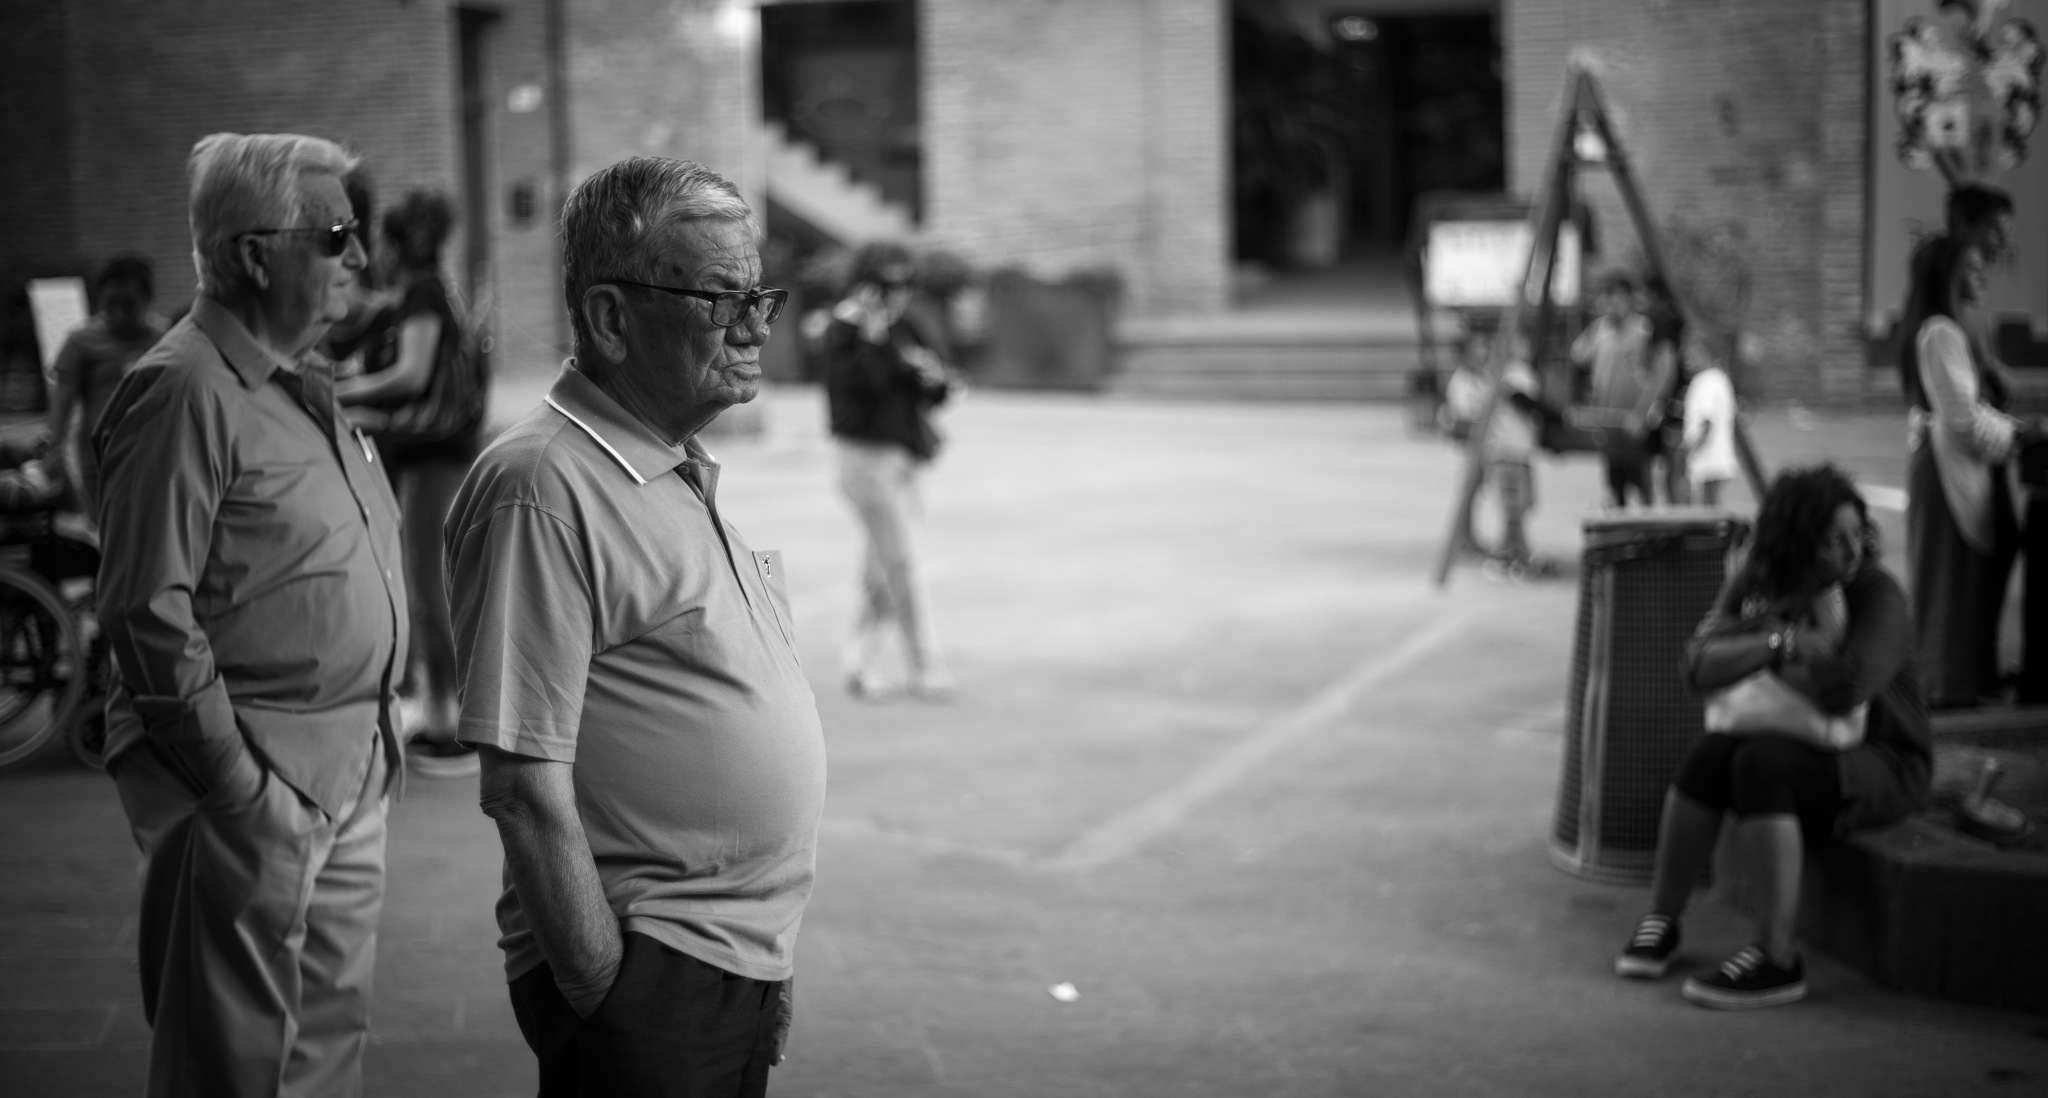 The age of boredom by LorenzoVella